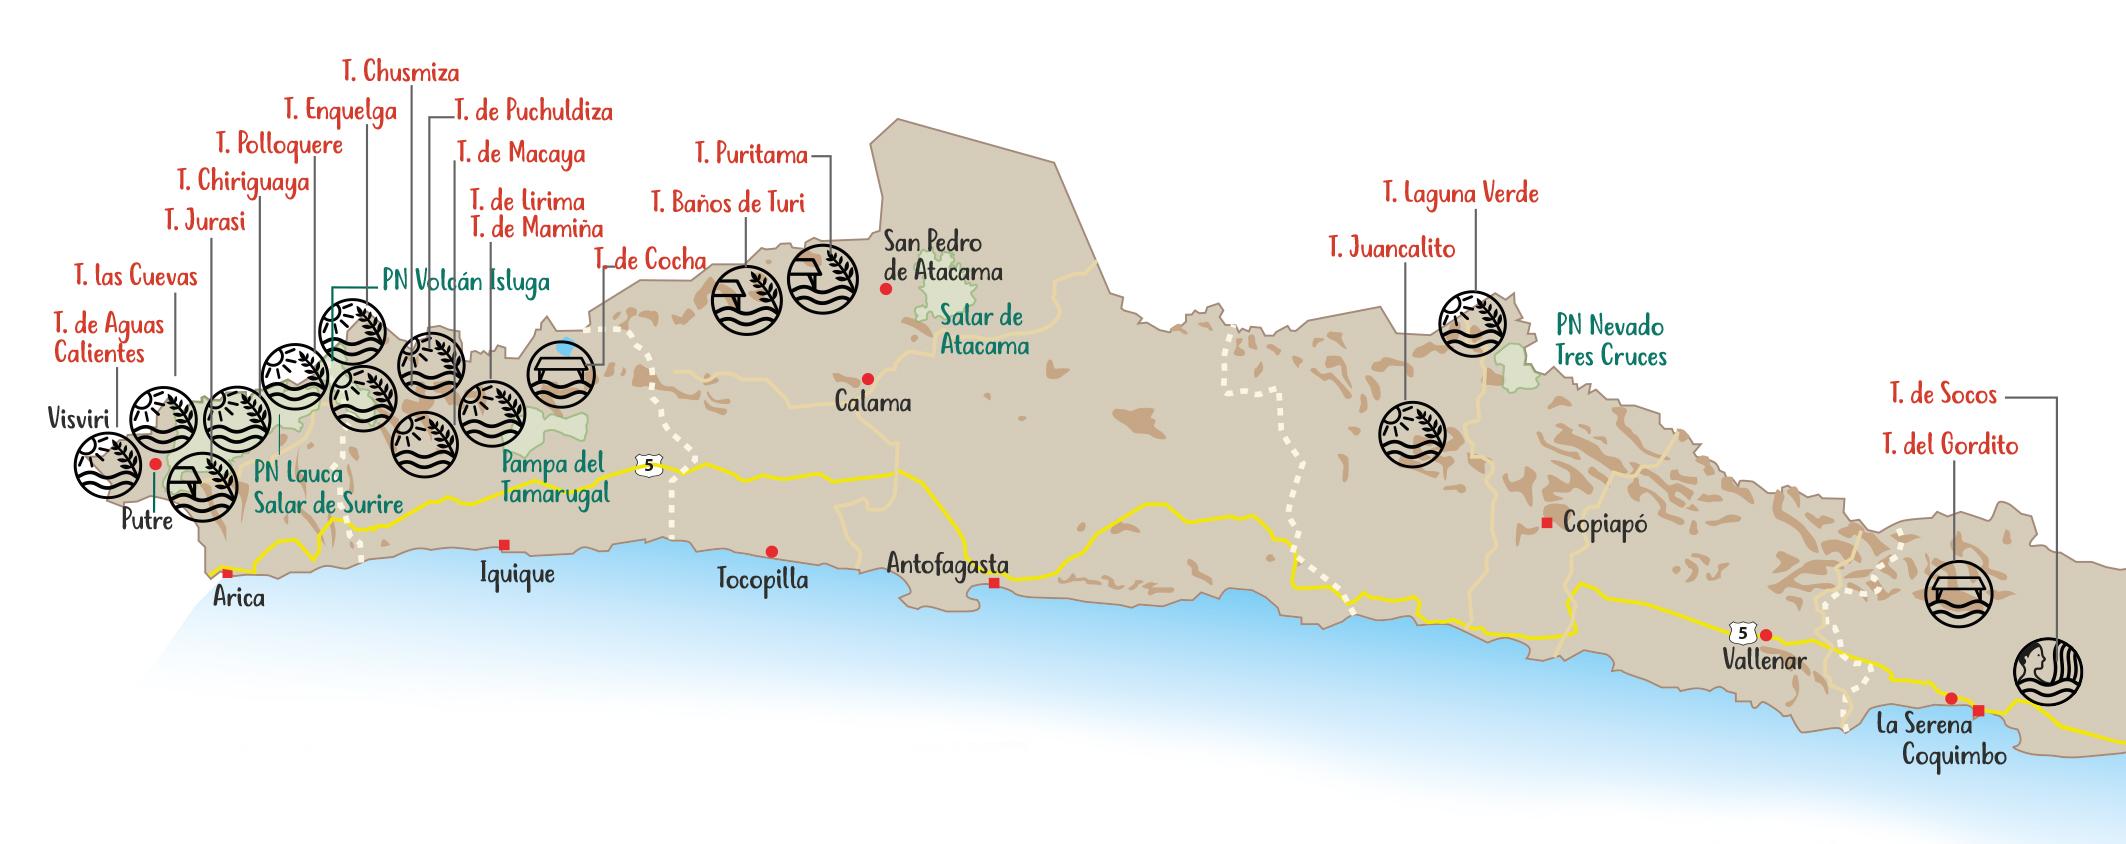 Mapa de Termas Chile Central